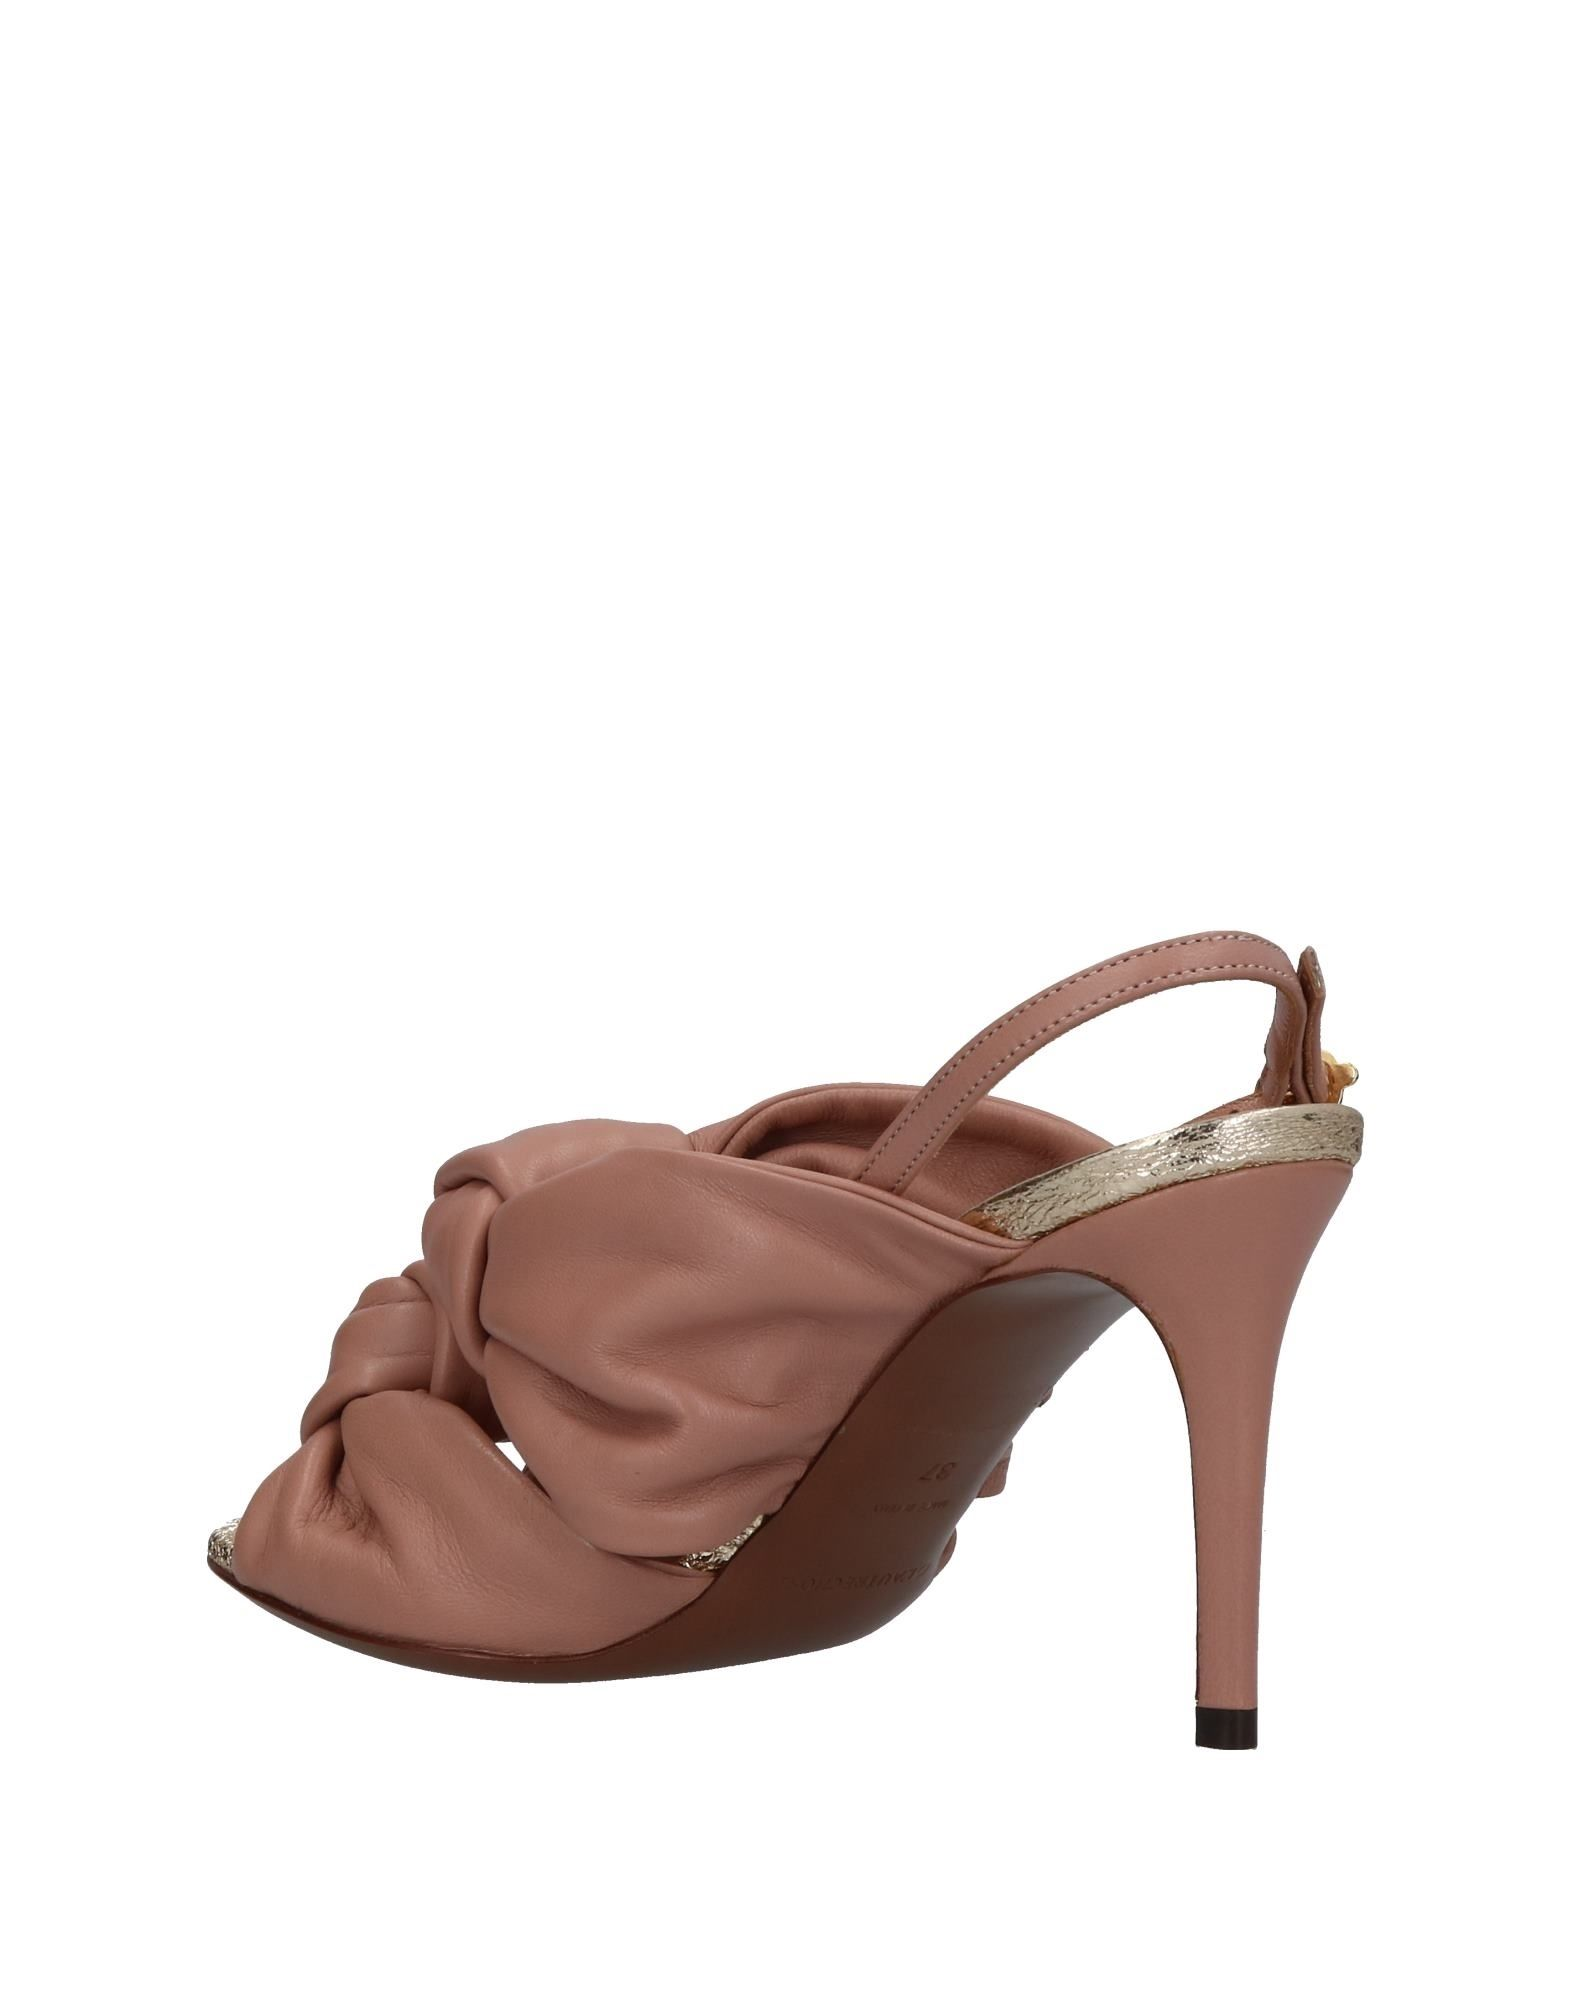 L' Autre Chose Gute Sandalen Damen  11381015FT Gute Chose Qualität beliebte Schuhe 195714